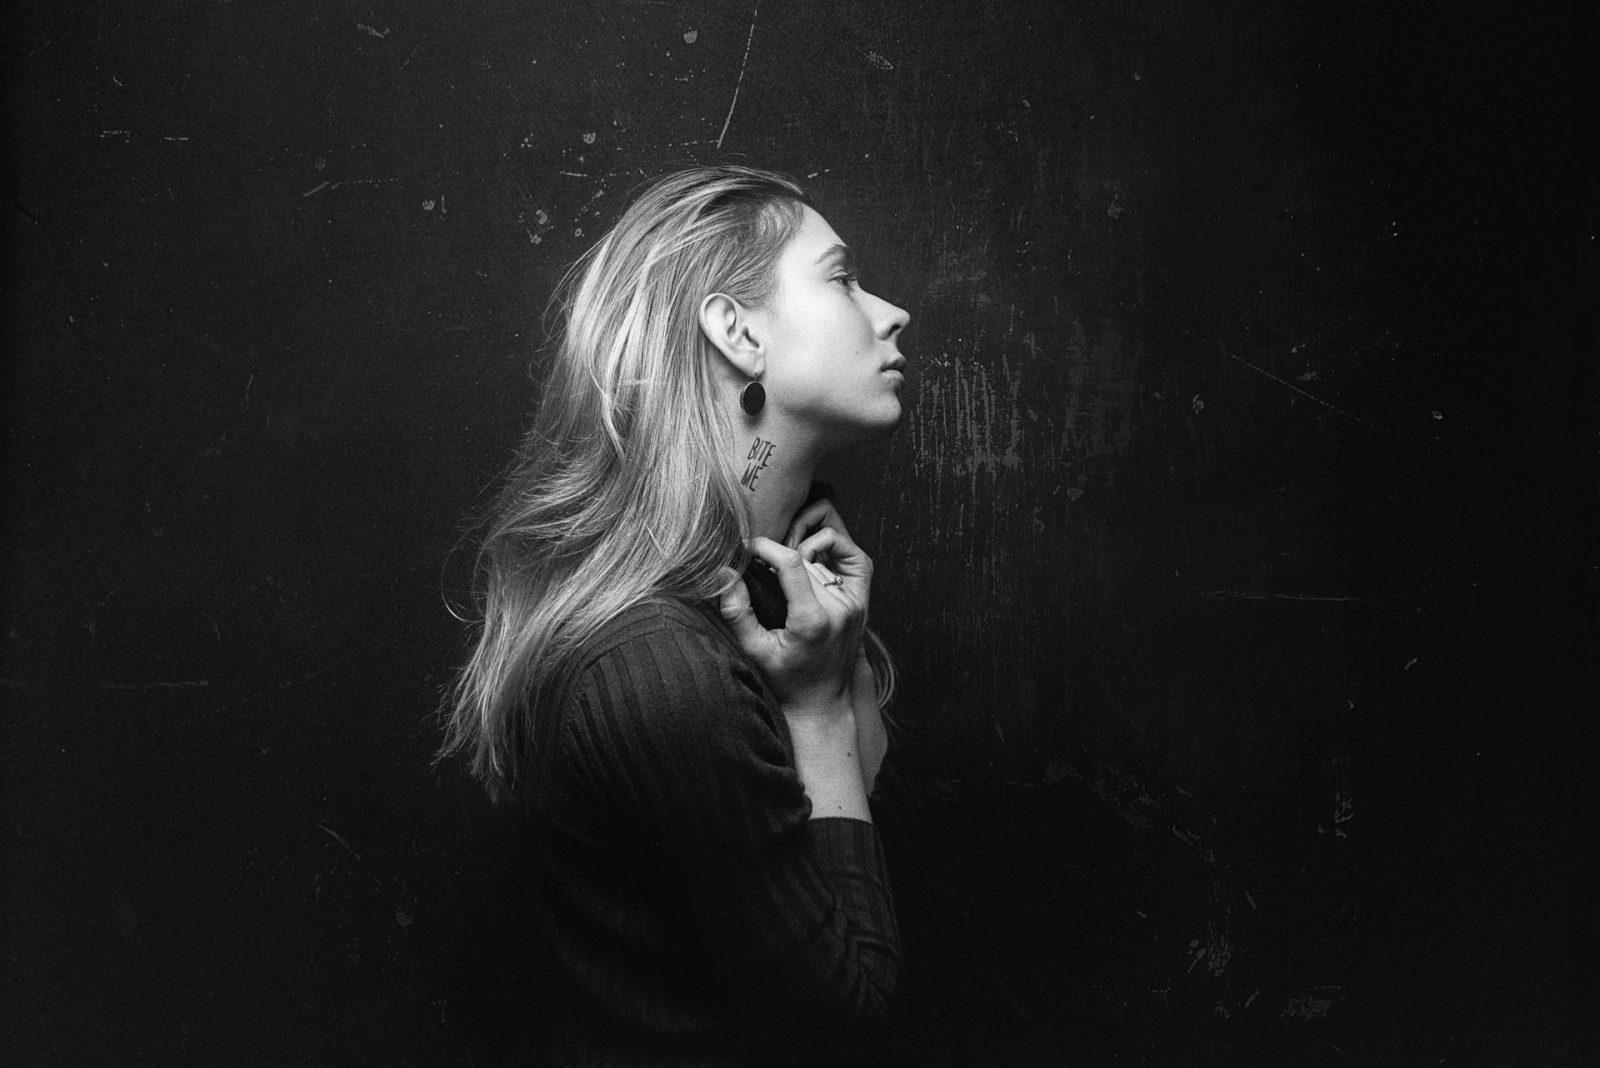 woman in darkness sad